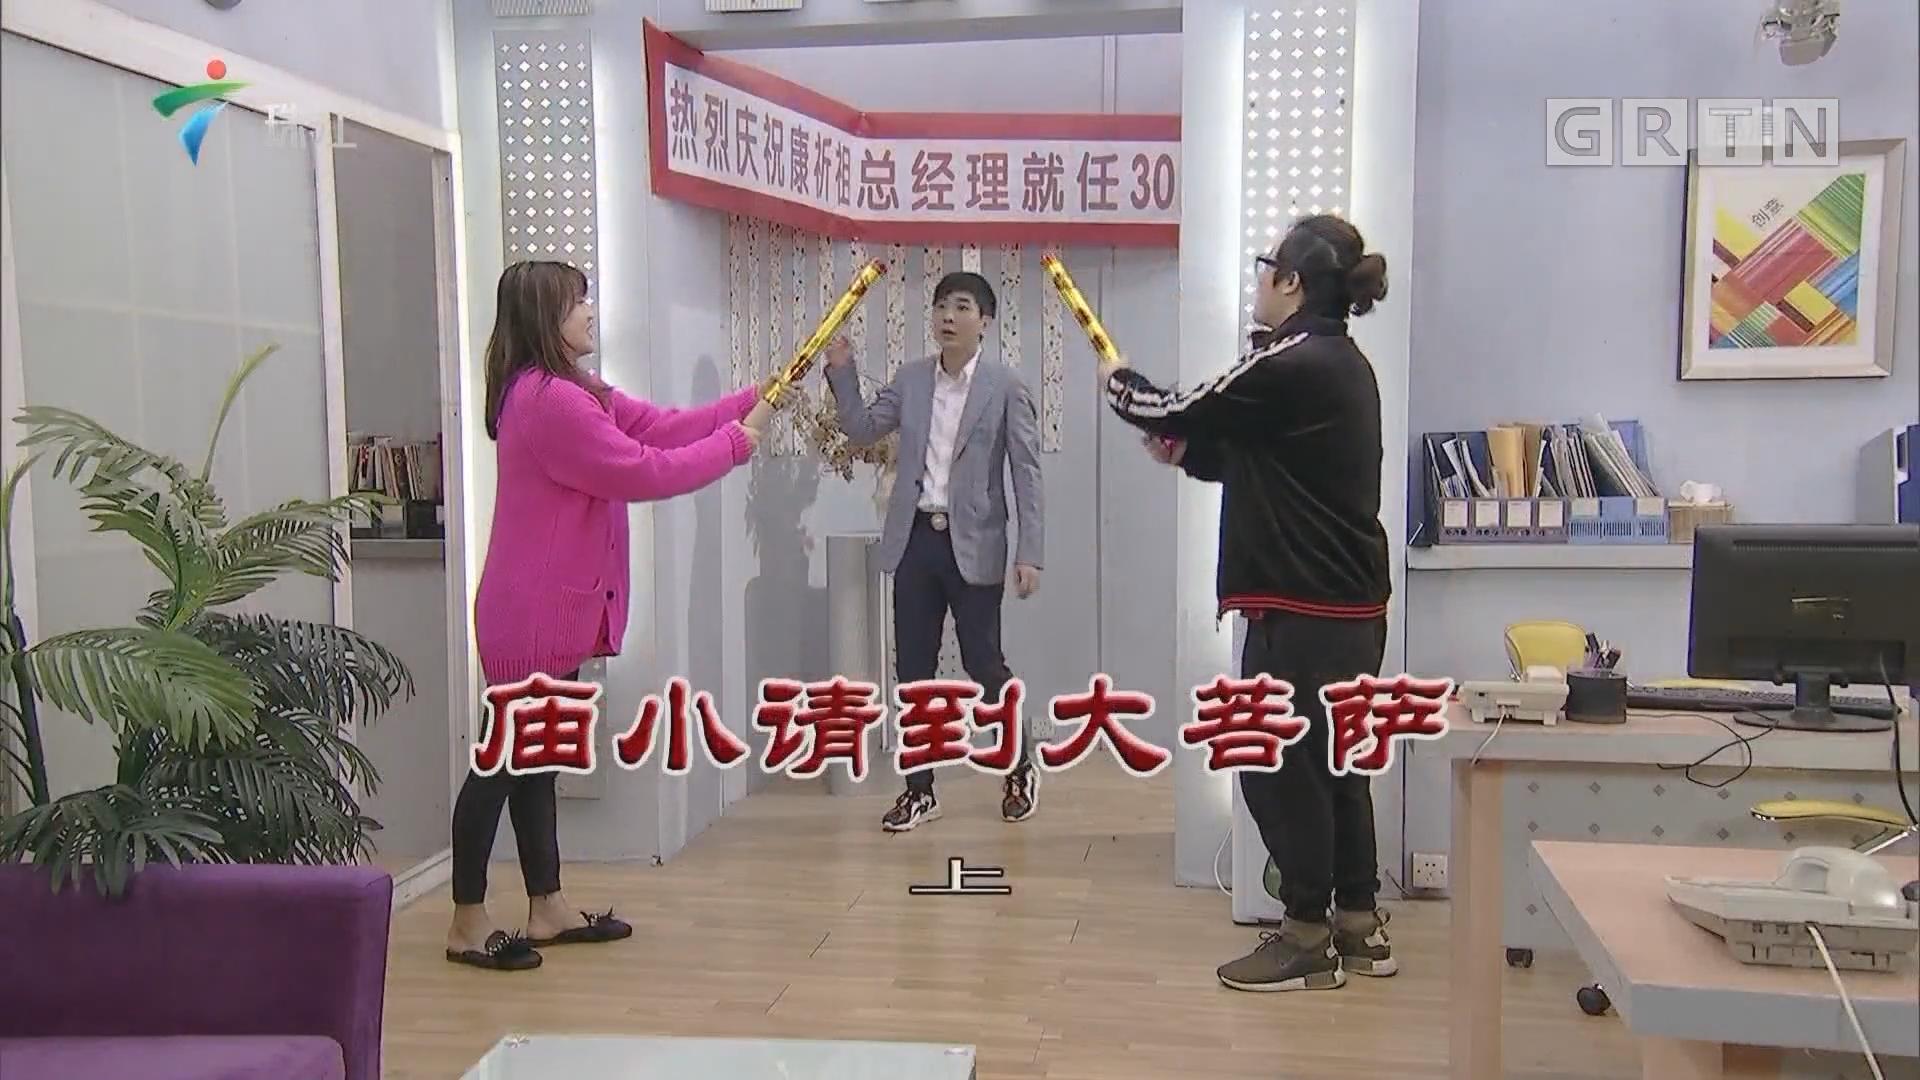 [HD][2019-06-09]外來媳婦本地郎:廟小請到大菩薩(上)